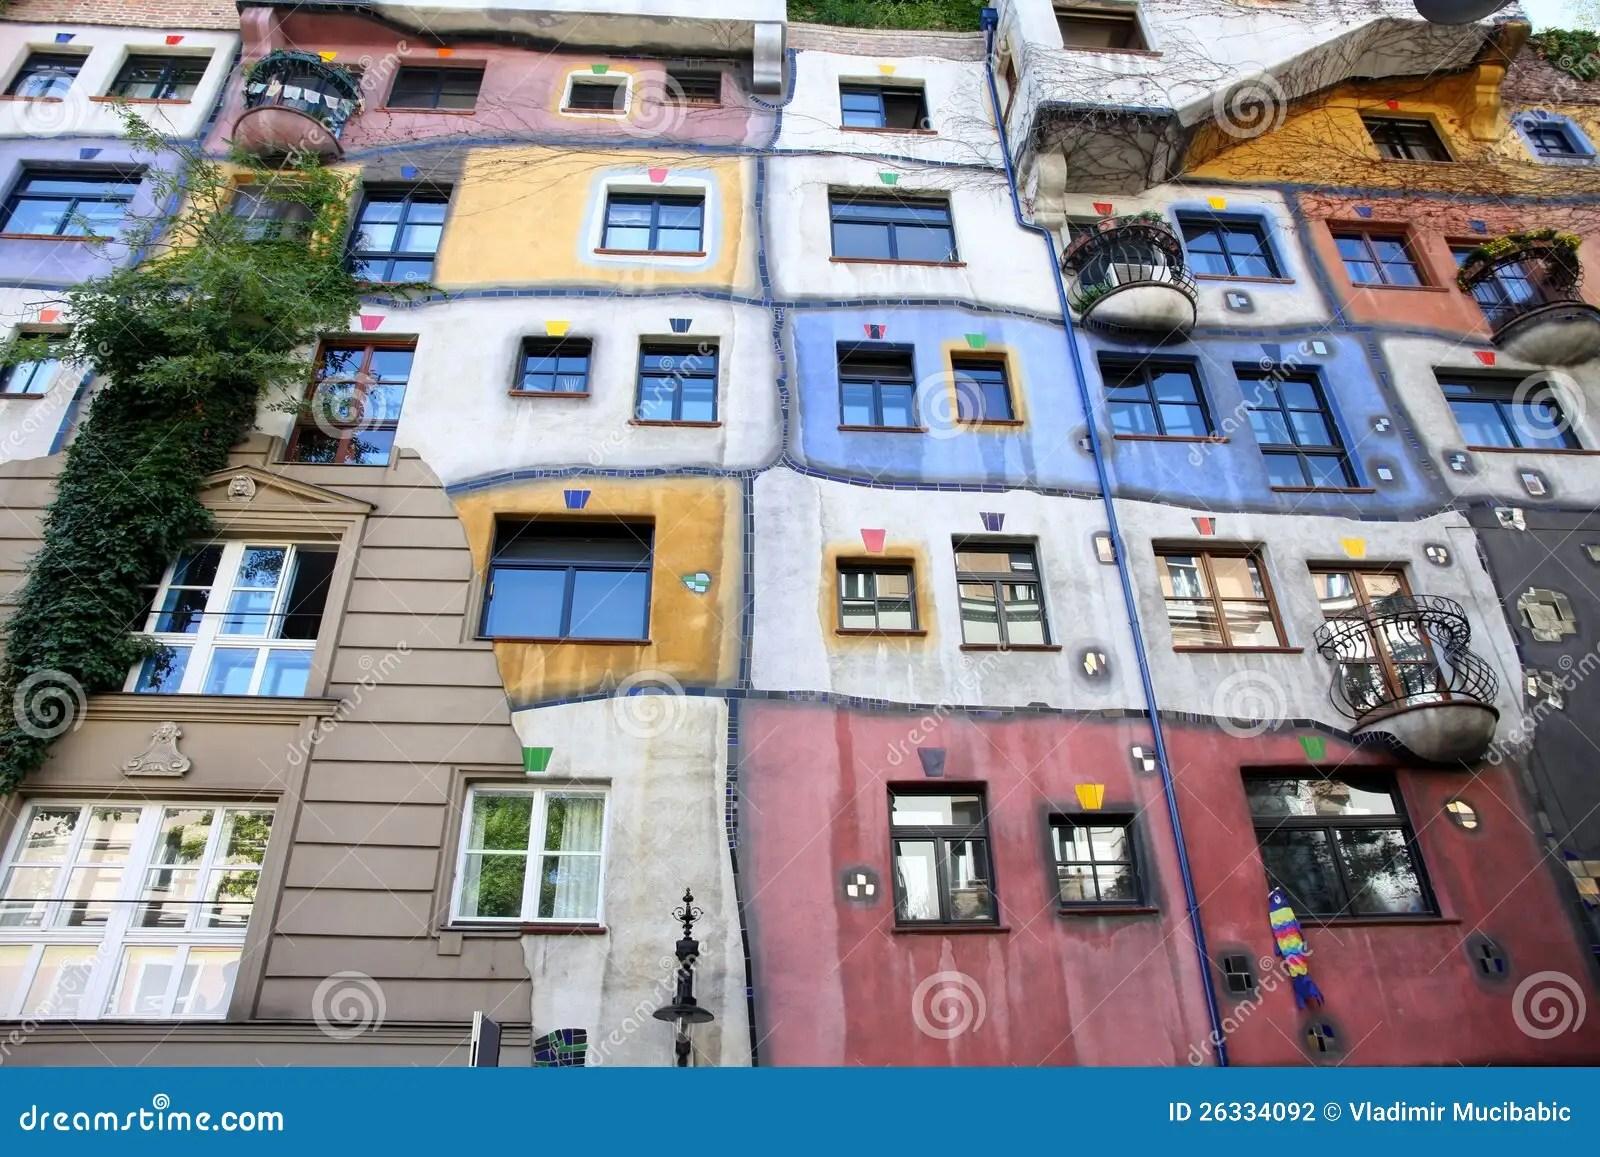 Hundertwasser House In Vienna, Austria Stock Photo - Image of balcony, europe: 26334092